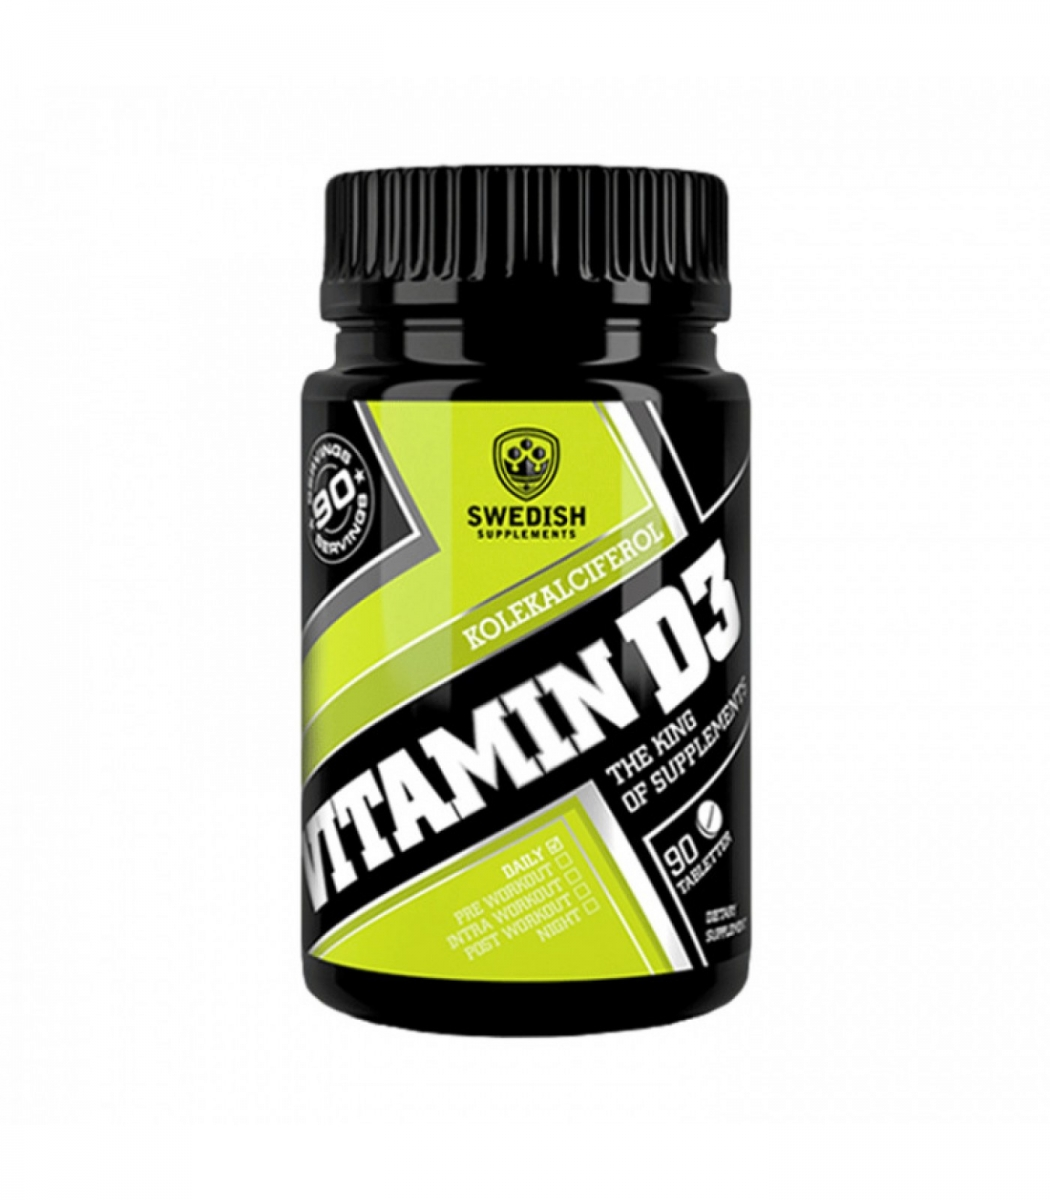 SWEDISH Supplements Vitamin D3 4000iu 90tabs